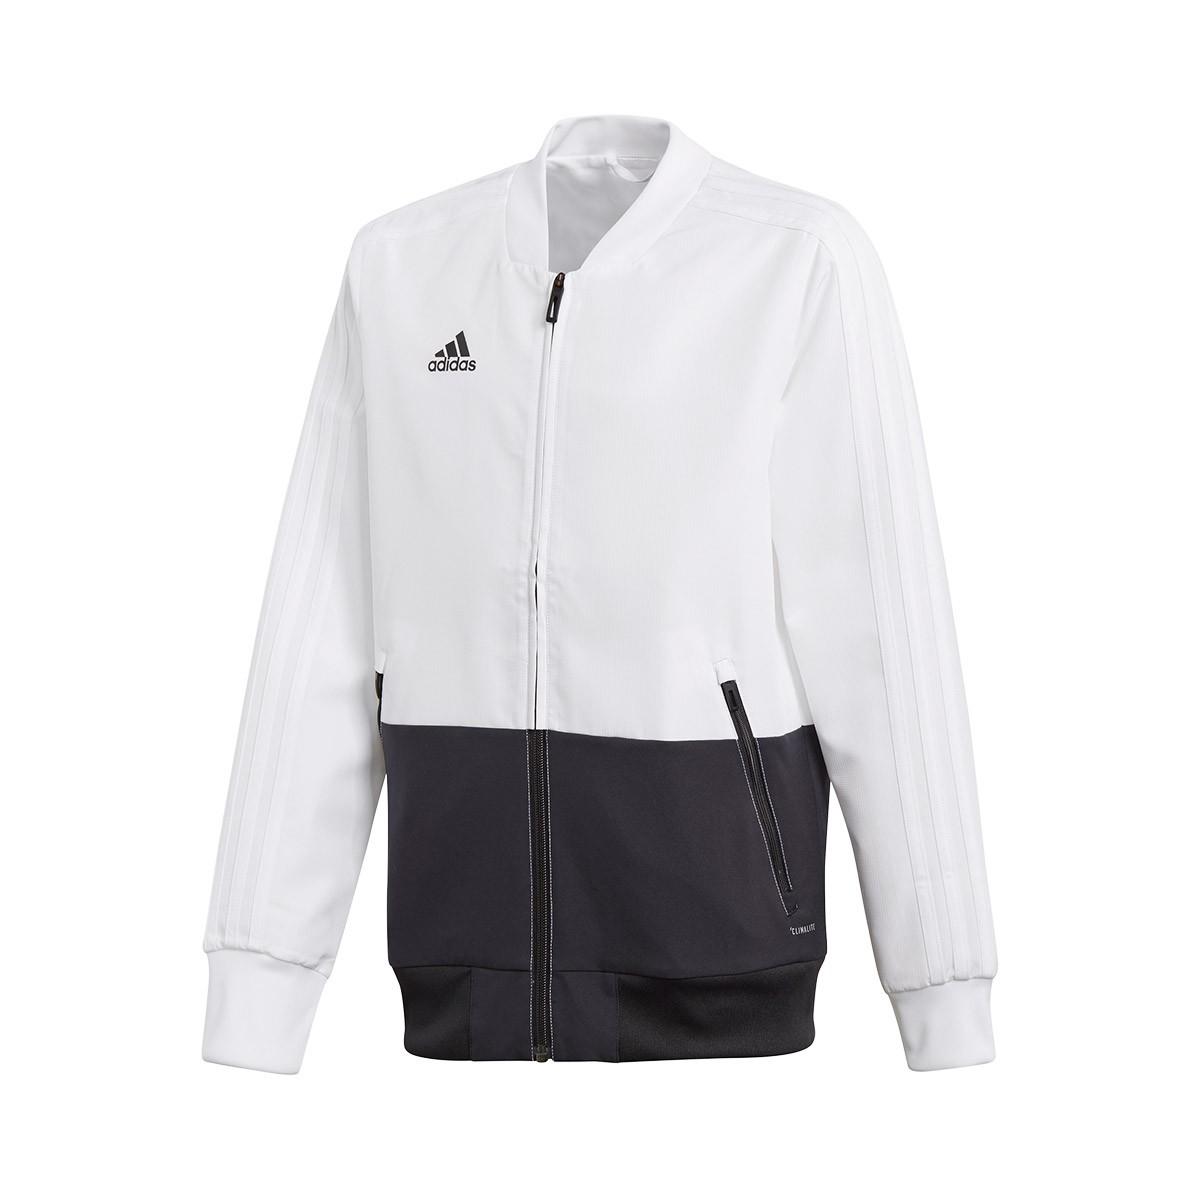 Chaqueta adidas Condivo 18 Presentation Niño White Black